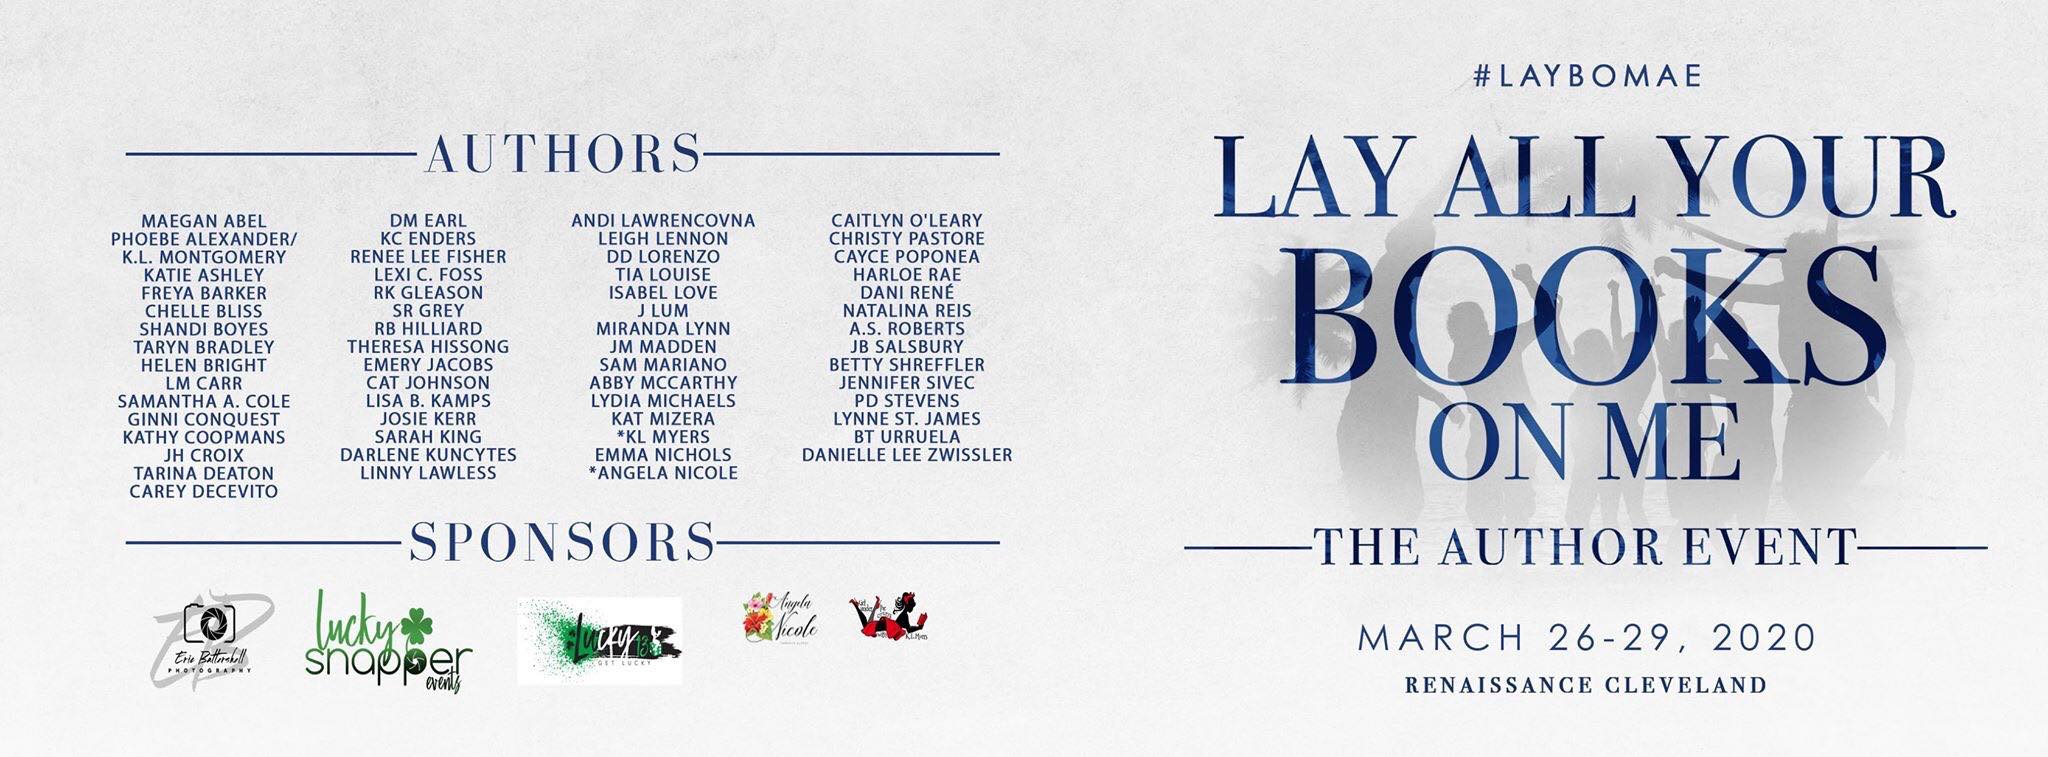 LAYBOMAE 2020 Mar 26-29.jpg